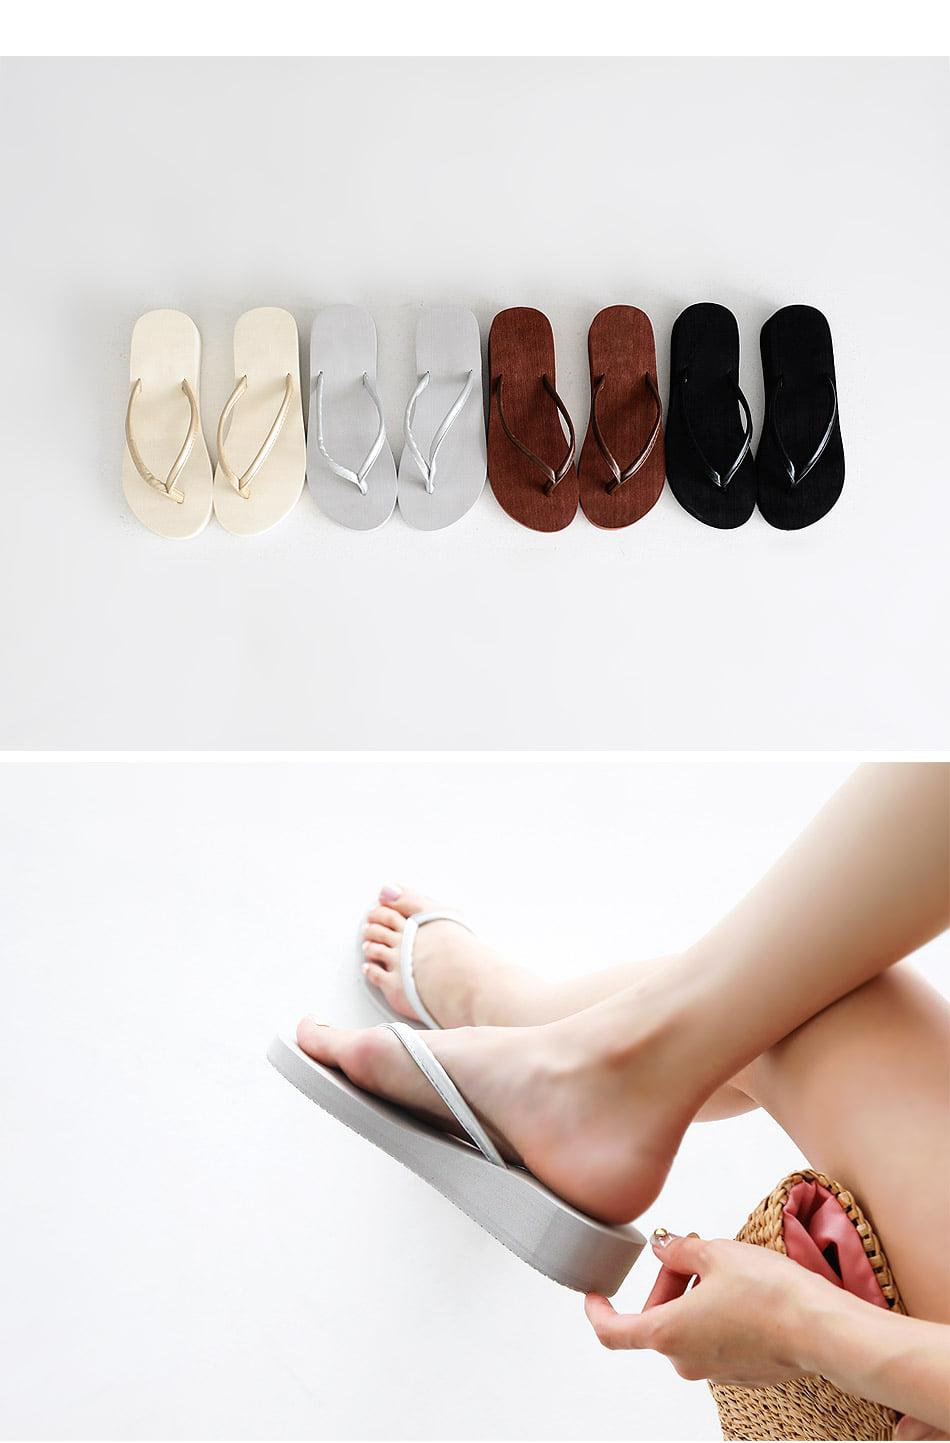 Rieden Wedge Slippers 3cm